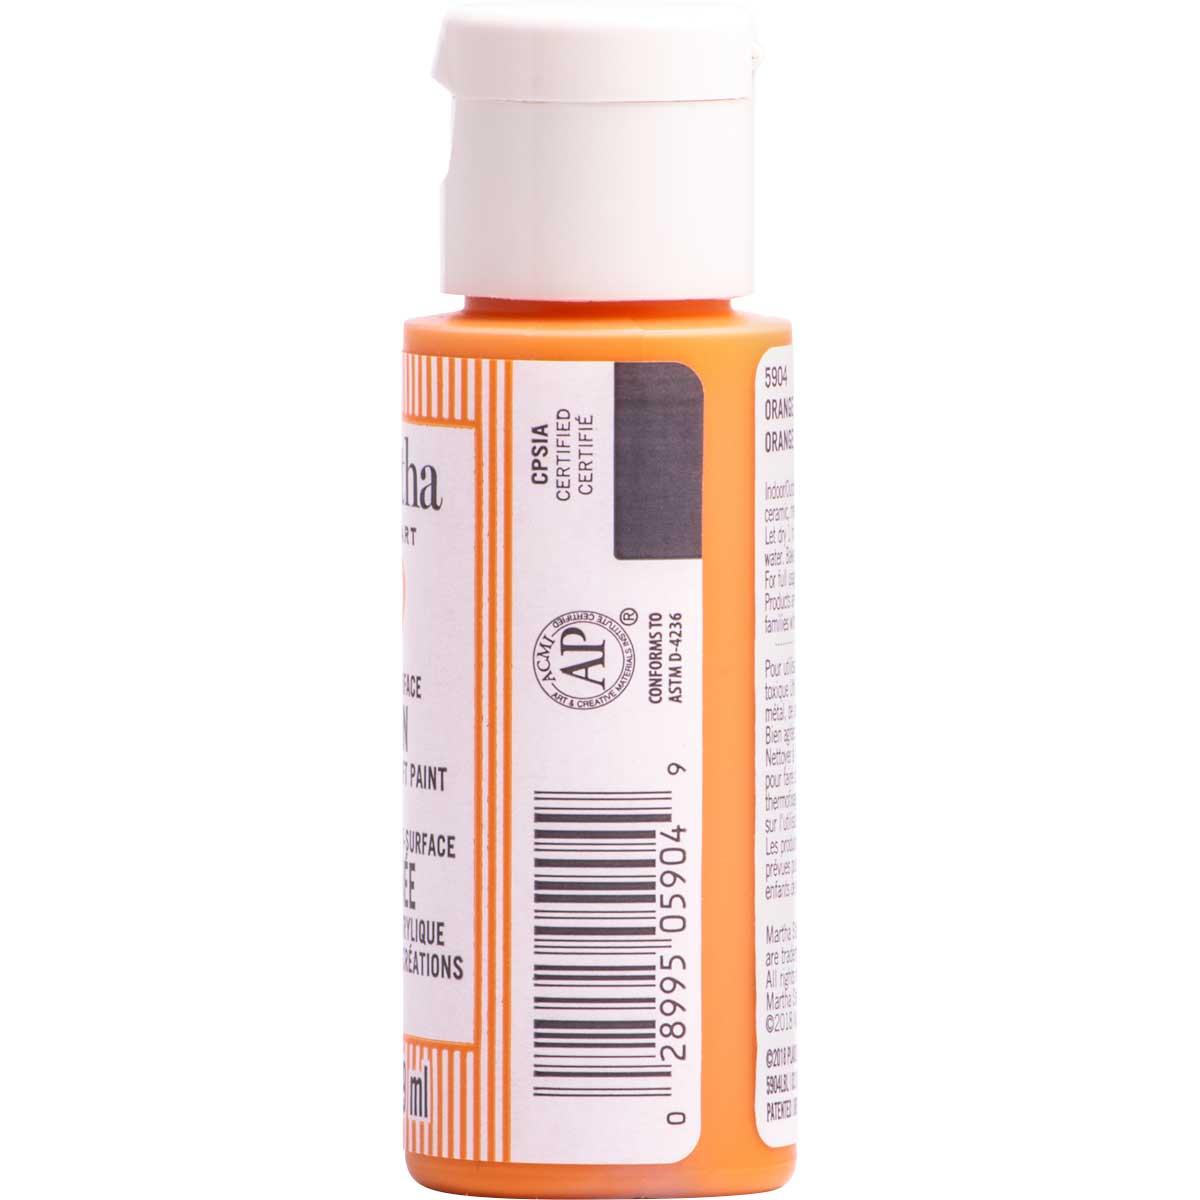 Martha Stewart ® Multi-Surface Satin Acrylic Craft Paint CPSIA - Orange Floatie, 2 oz. - 5904